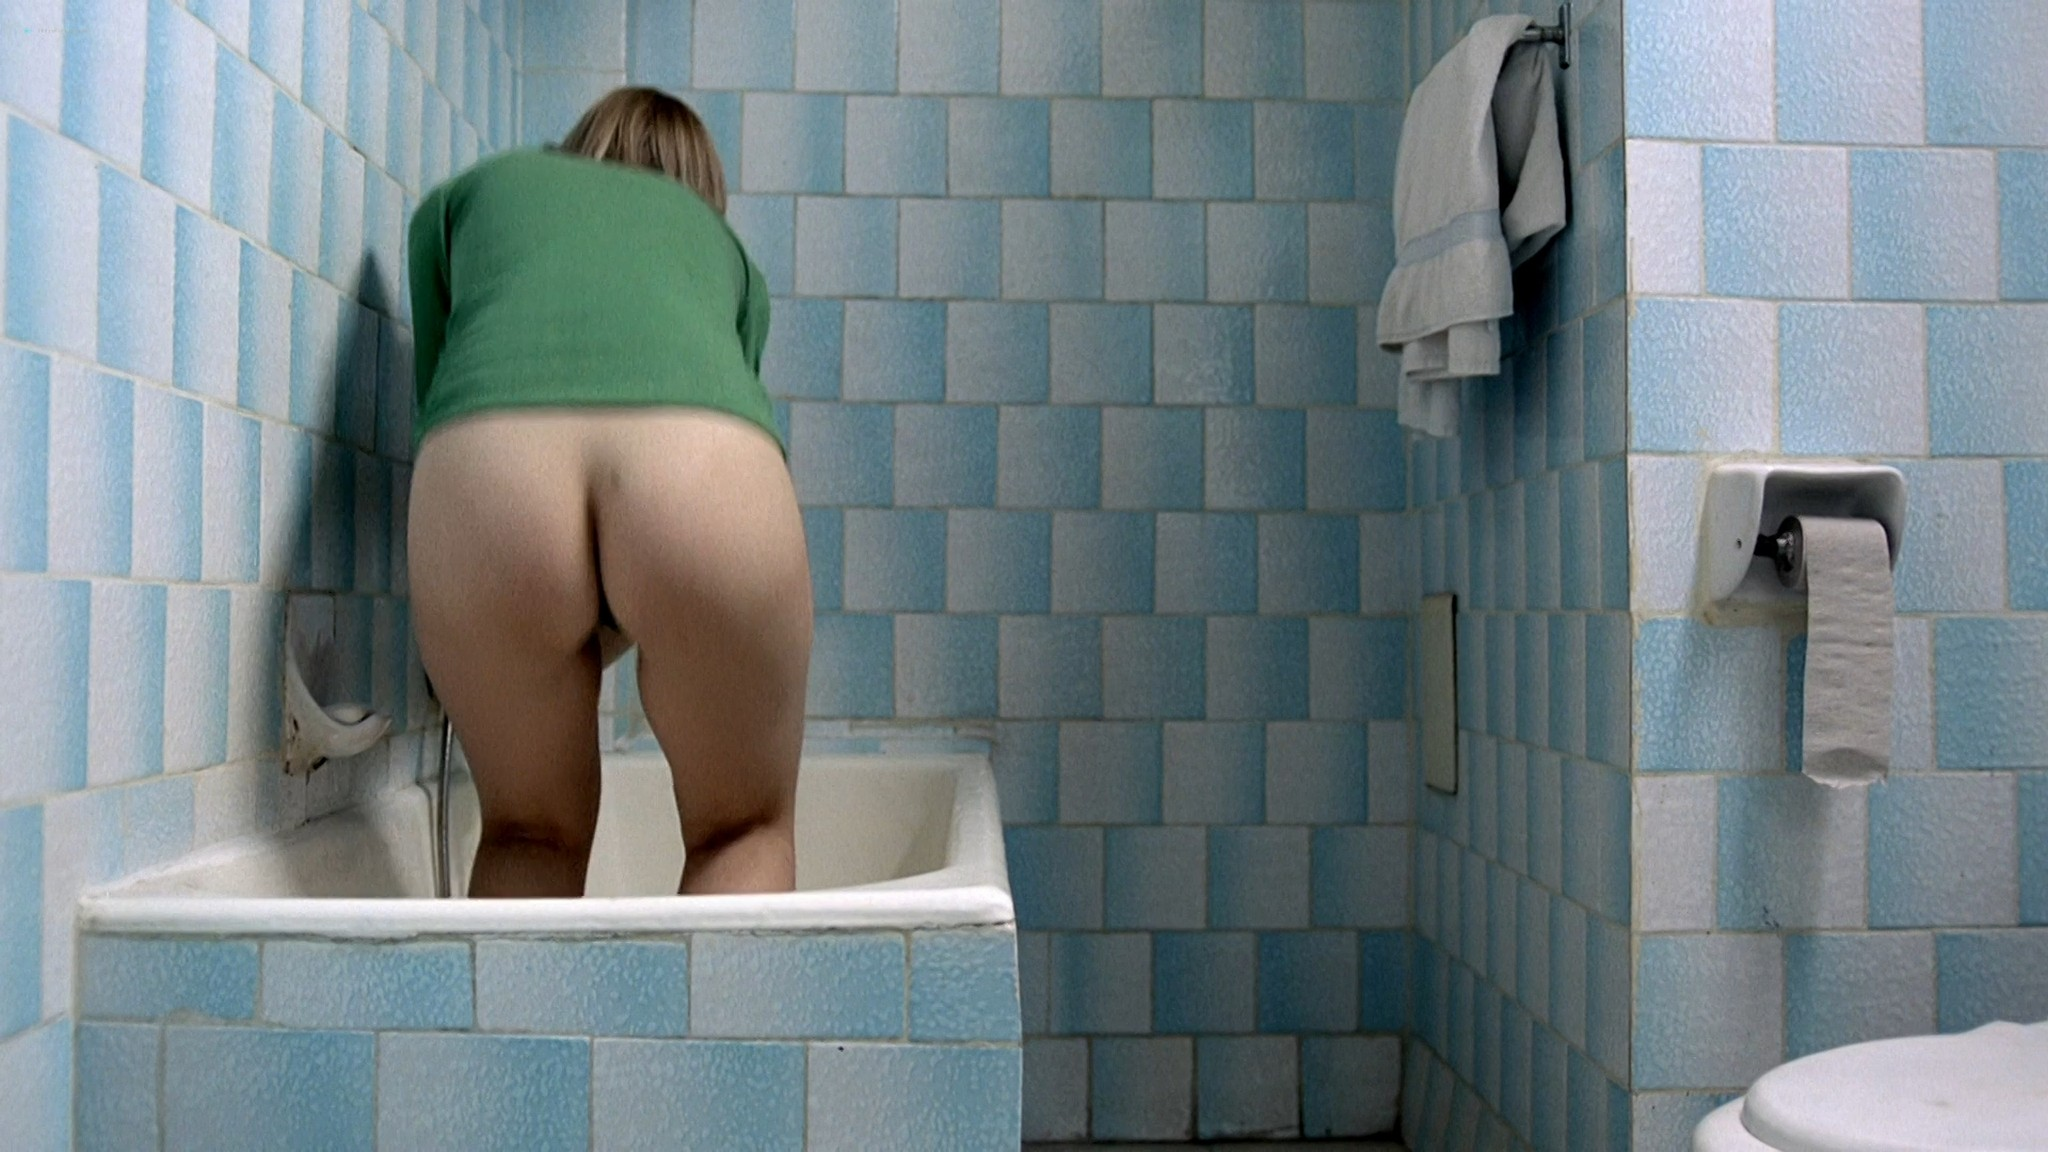 Laura Vasiliu nude bush Anamaria Marinca nude too 4 Months 3 Weeks and 2 Days RO 2007 1080p BluRay 008